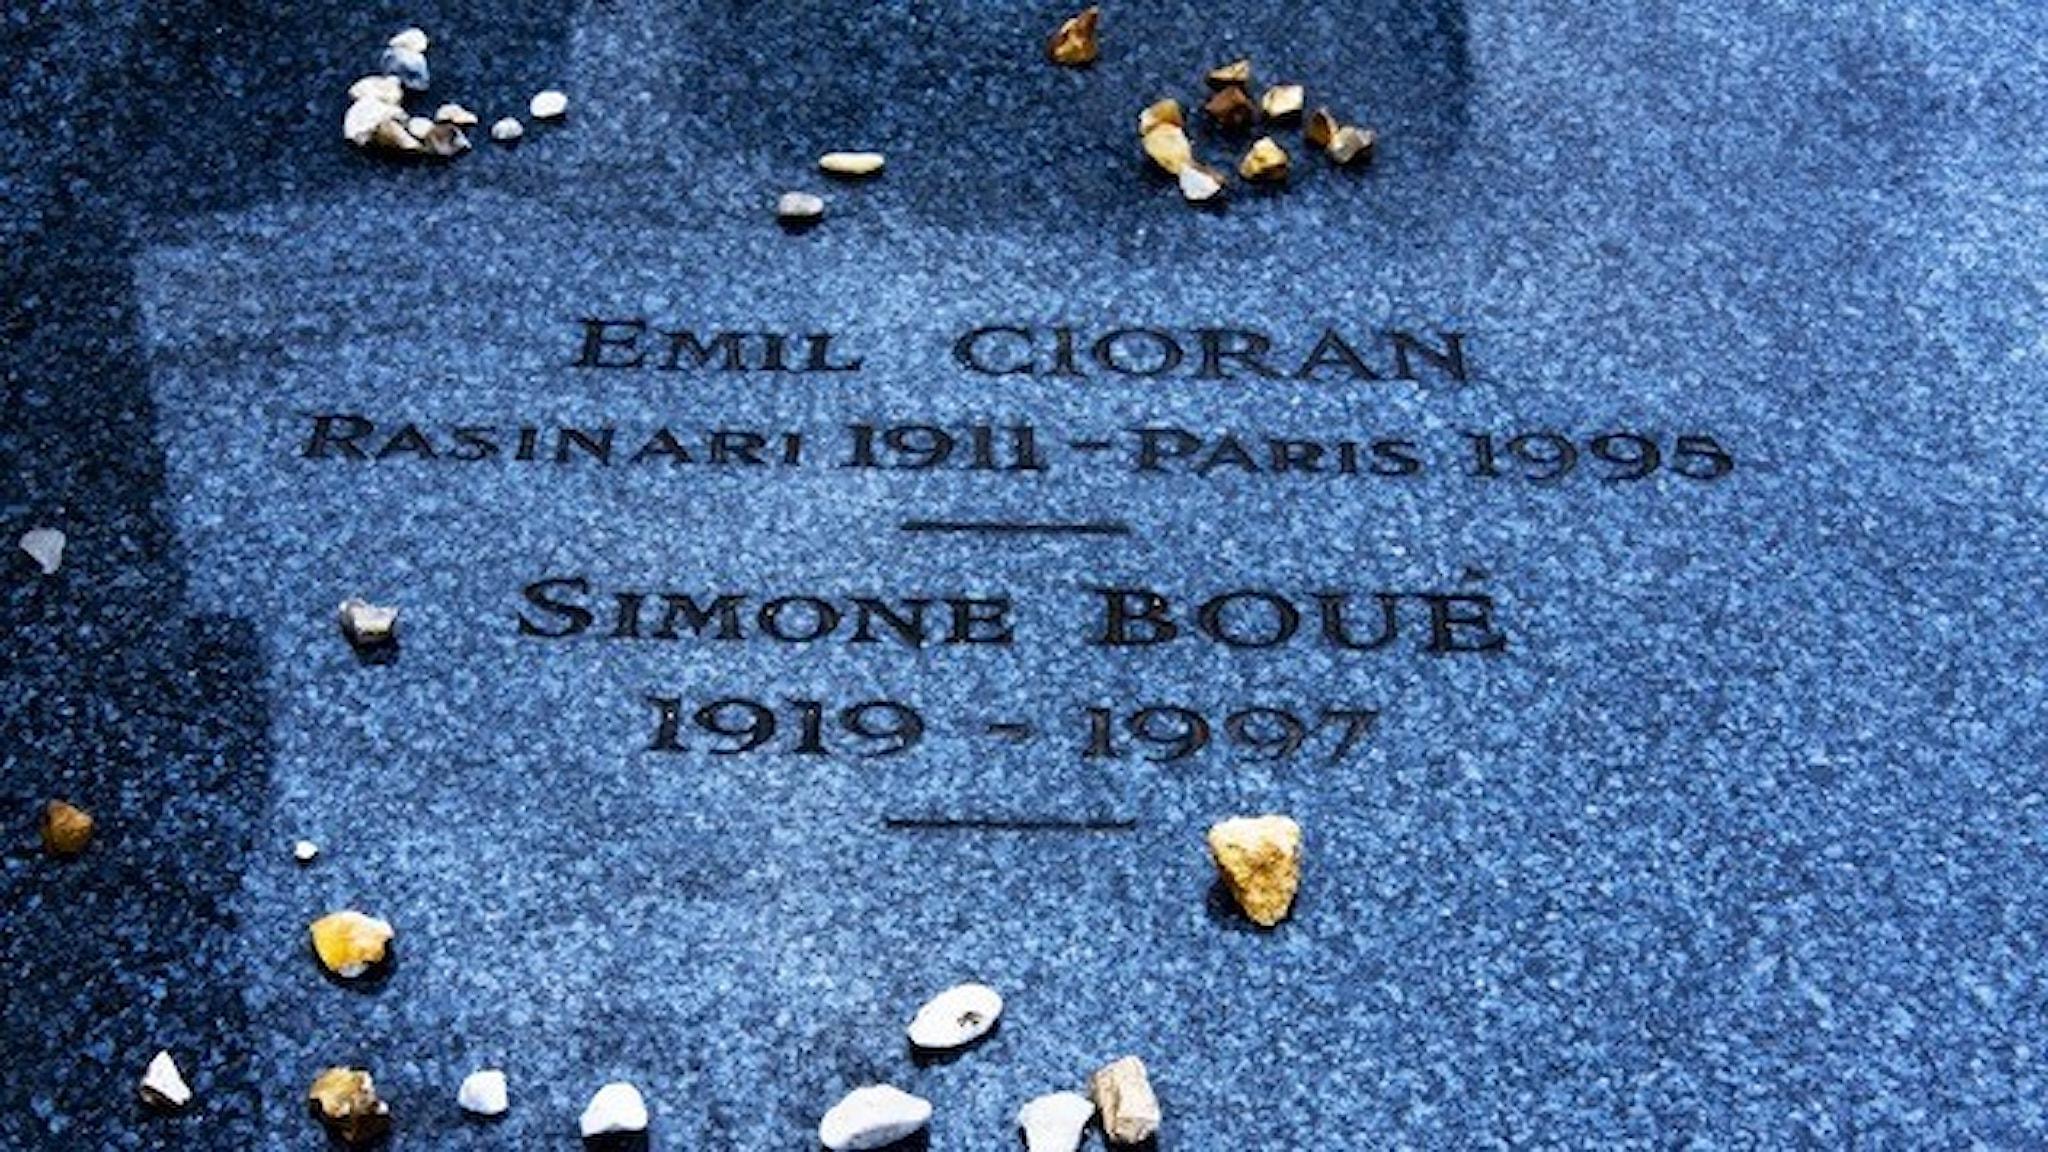 Emil Ciorans gravsten. Bild: Marco Belli, Flickr